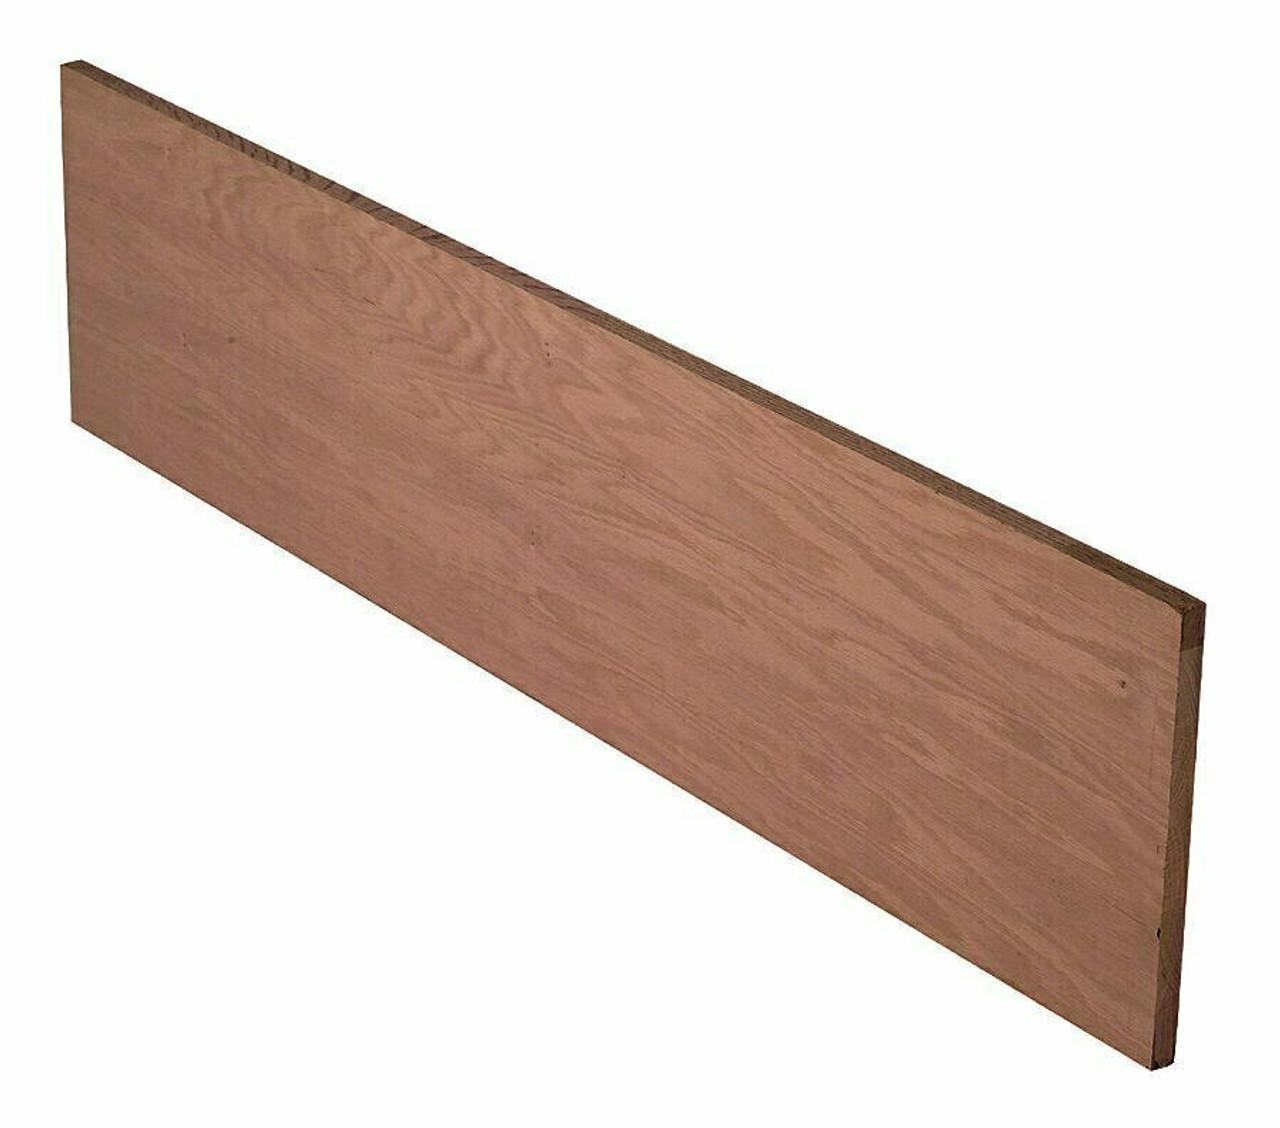 8075 Red Oak Stair Riser